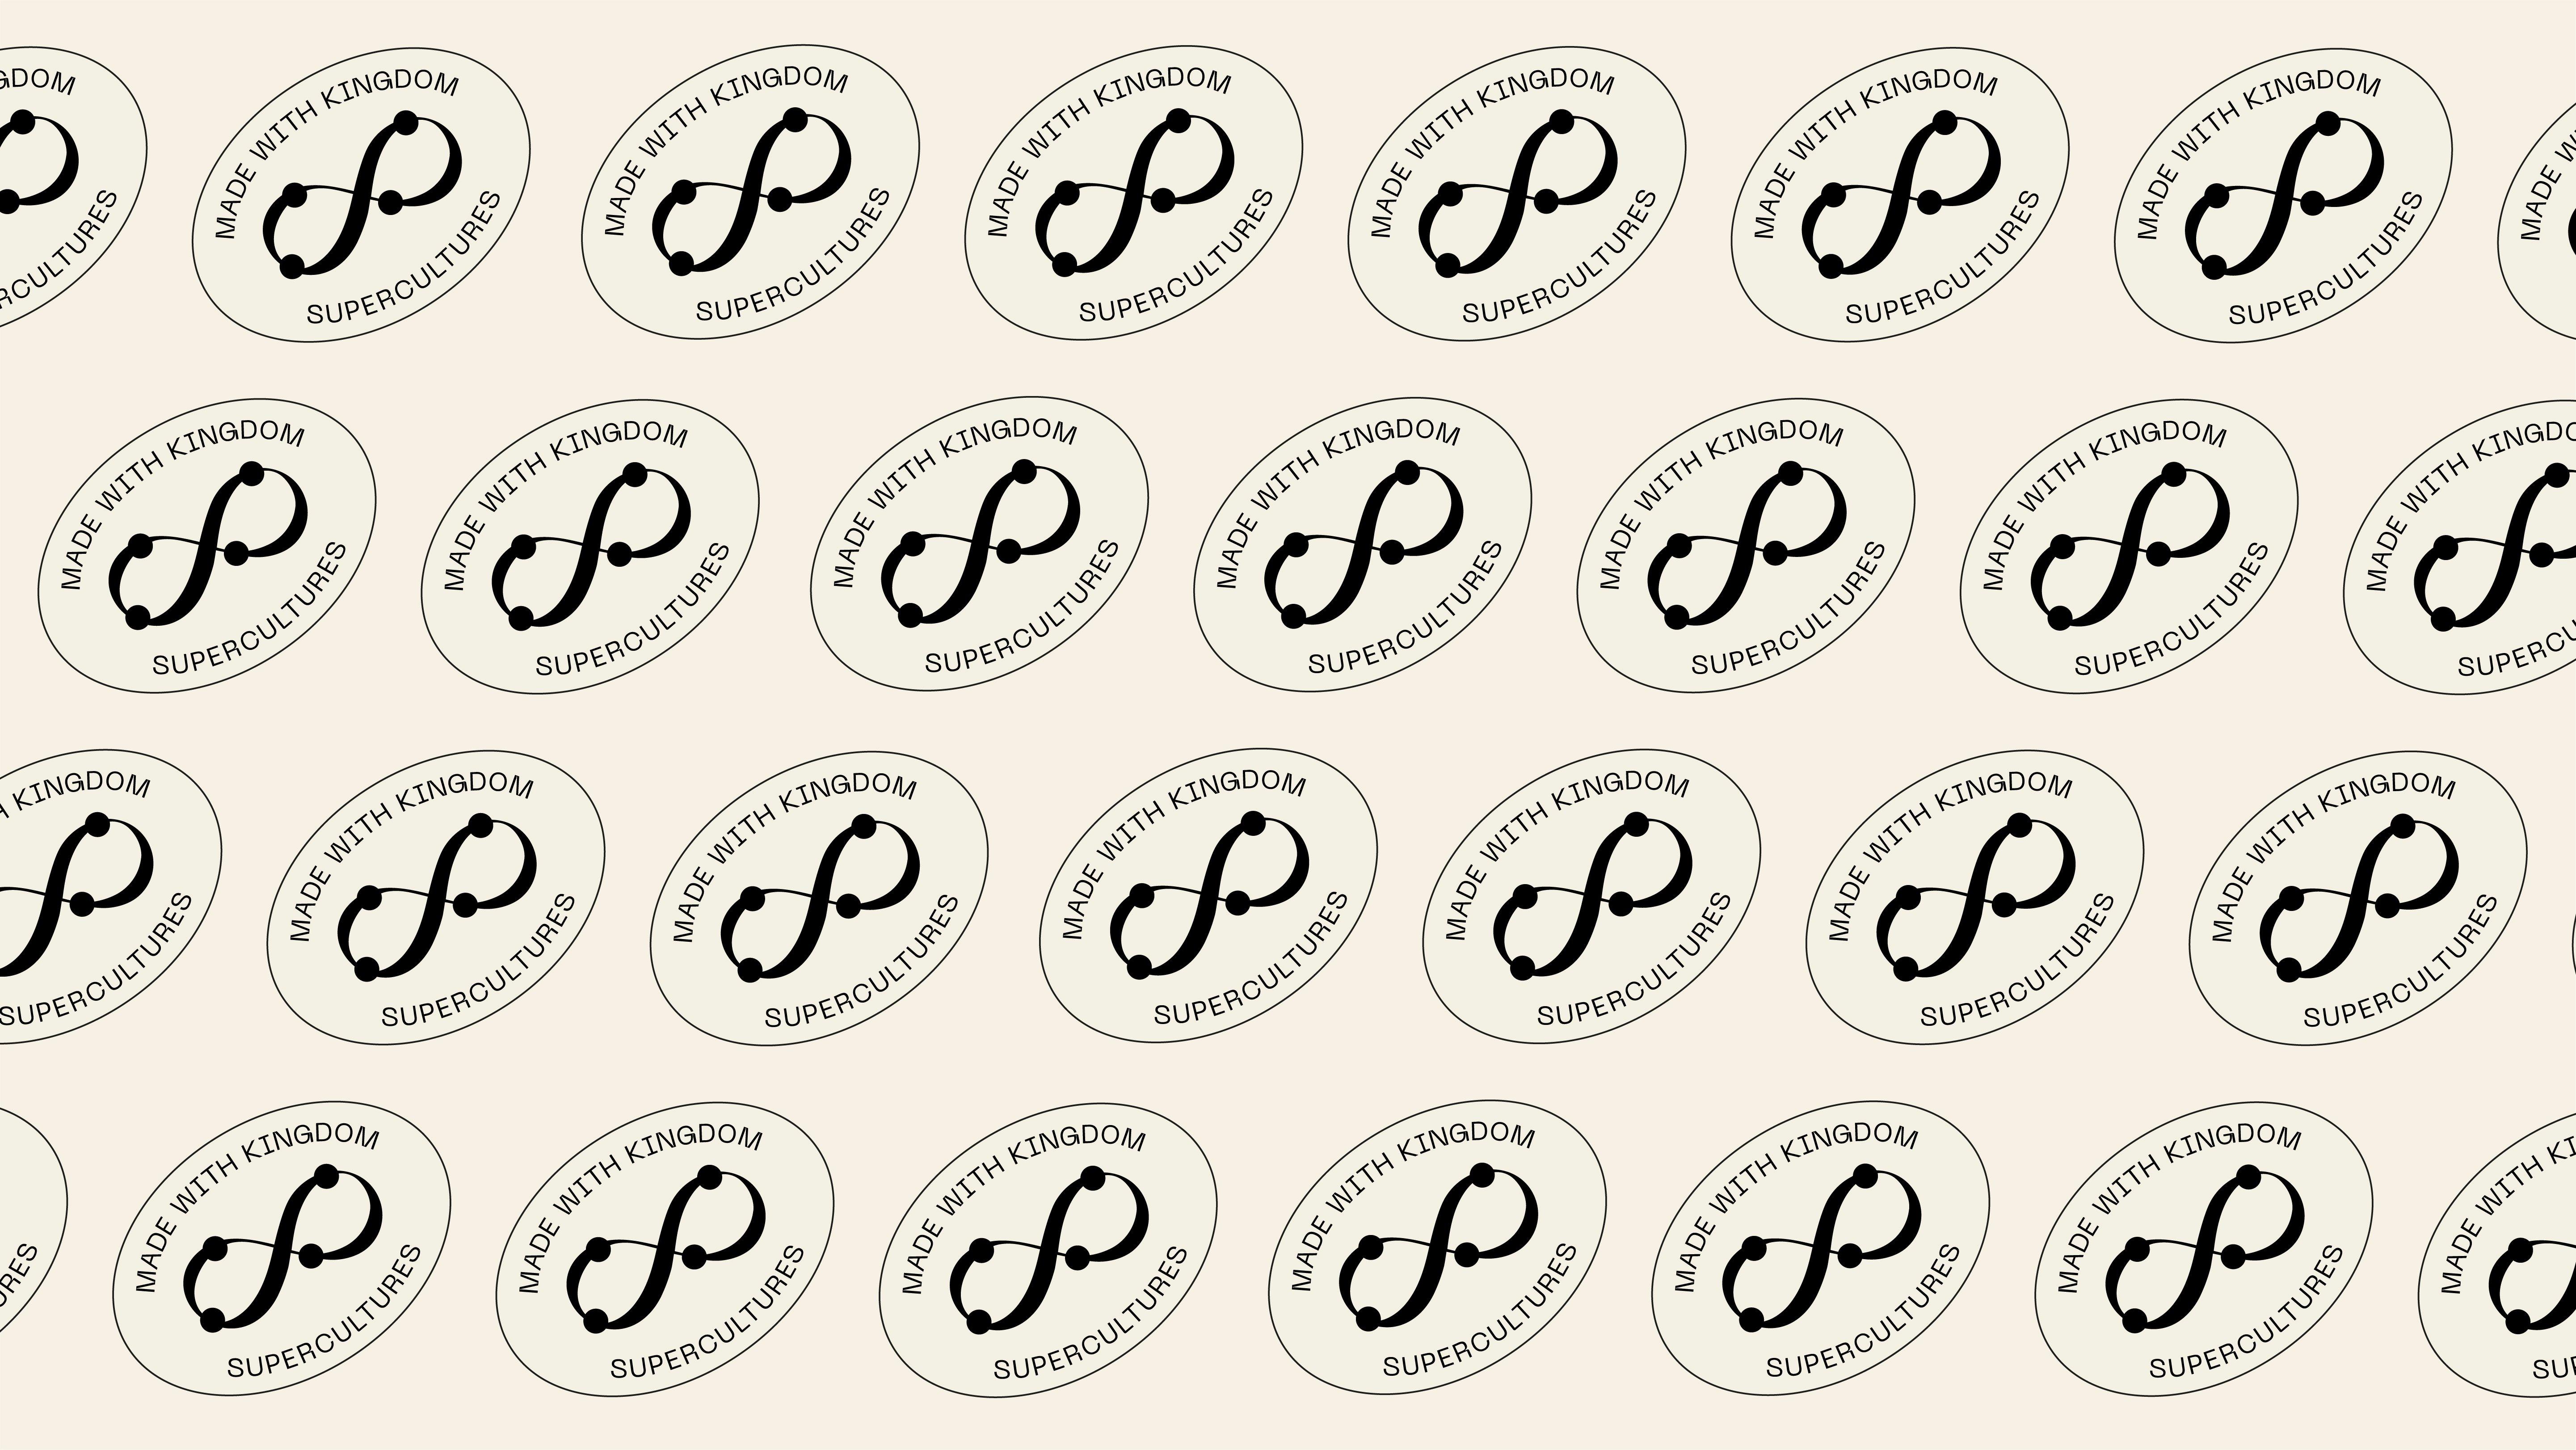 Kingdom Supercultures custom secondary mark pattern, design by RoAndCo